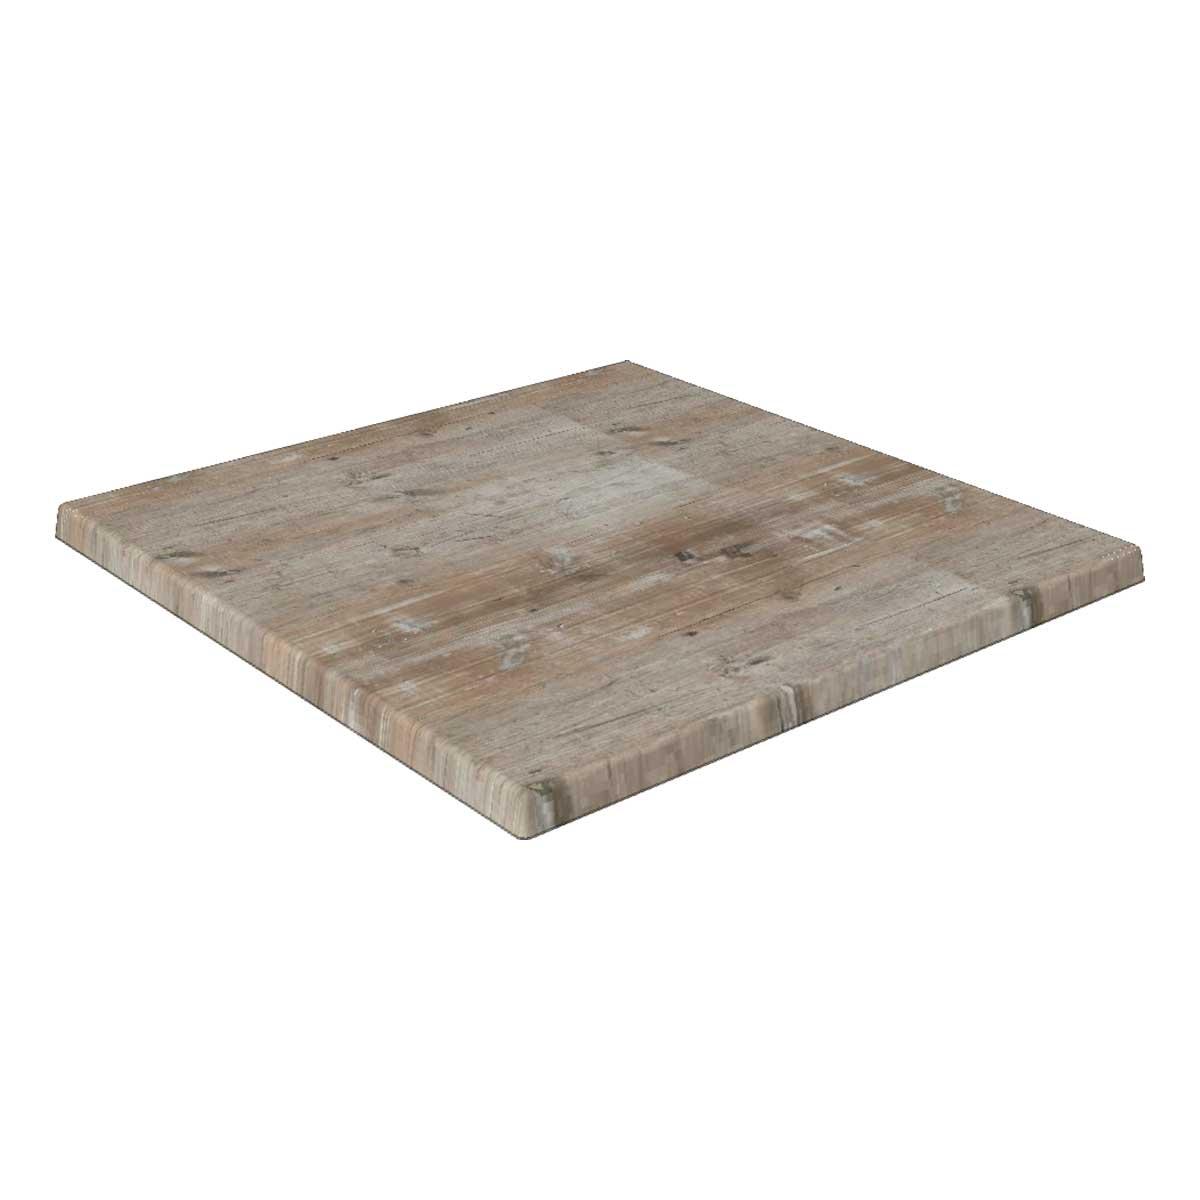 TICLA Q70 296 - https://www.werzalit.com/nl/product/tafelblad-classic-werzalit-q-60x60-296-findus-grau/